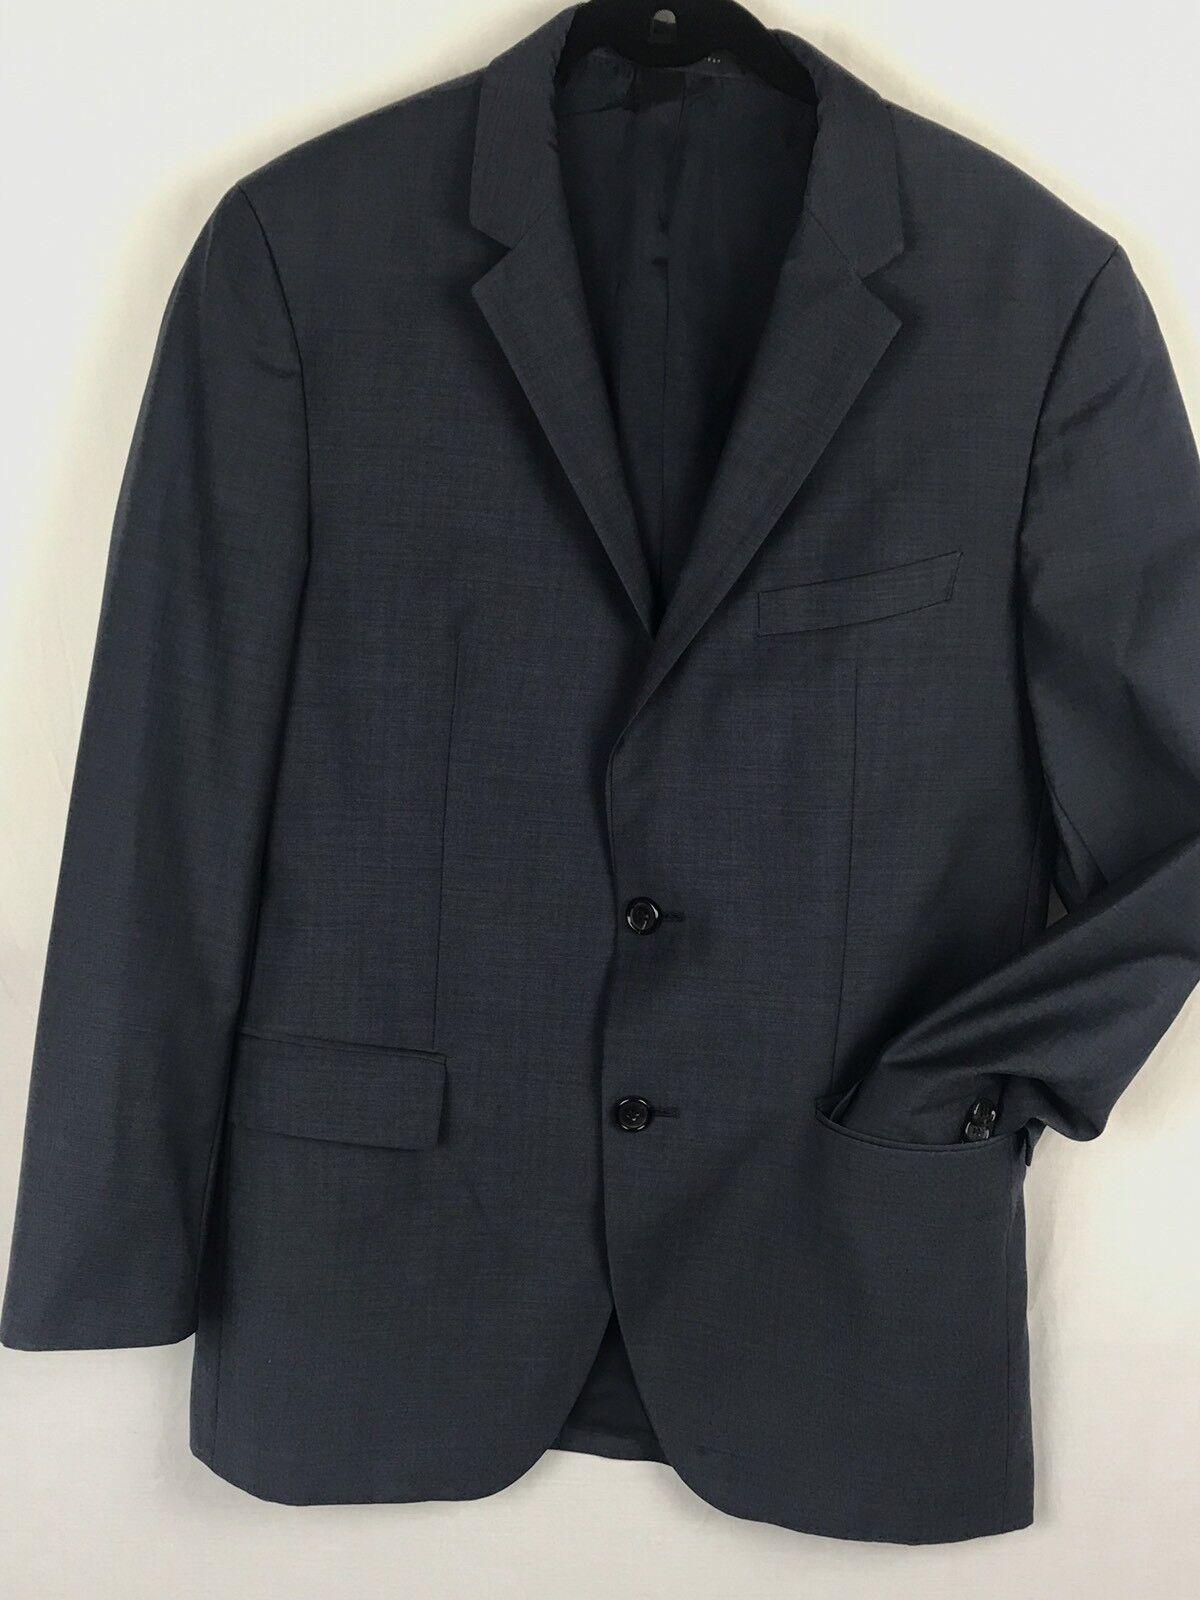 HUGO BOSS  Regular Fit 100% Wool bluee Pindot Blazer Sport Coat Sz 38R